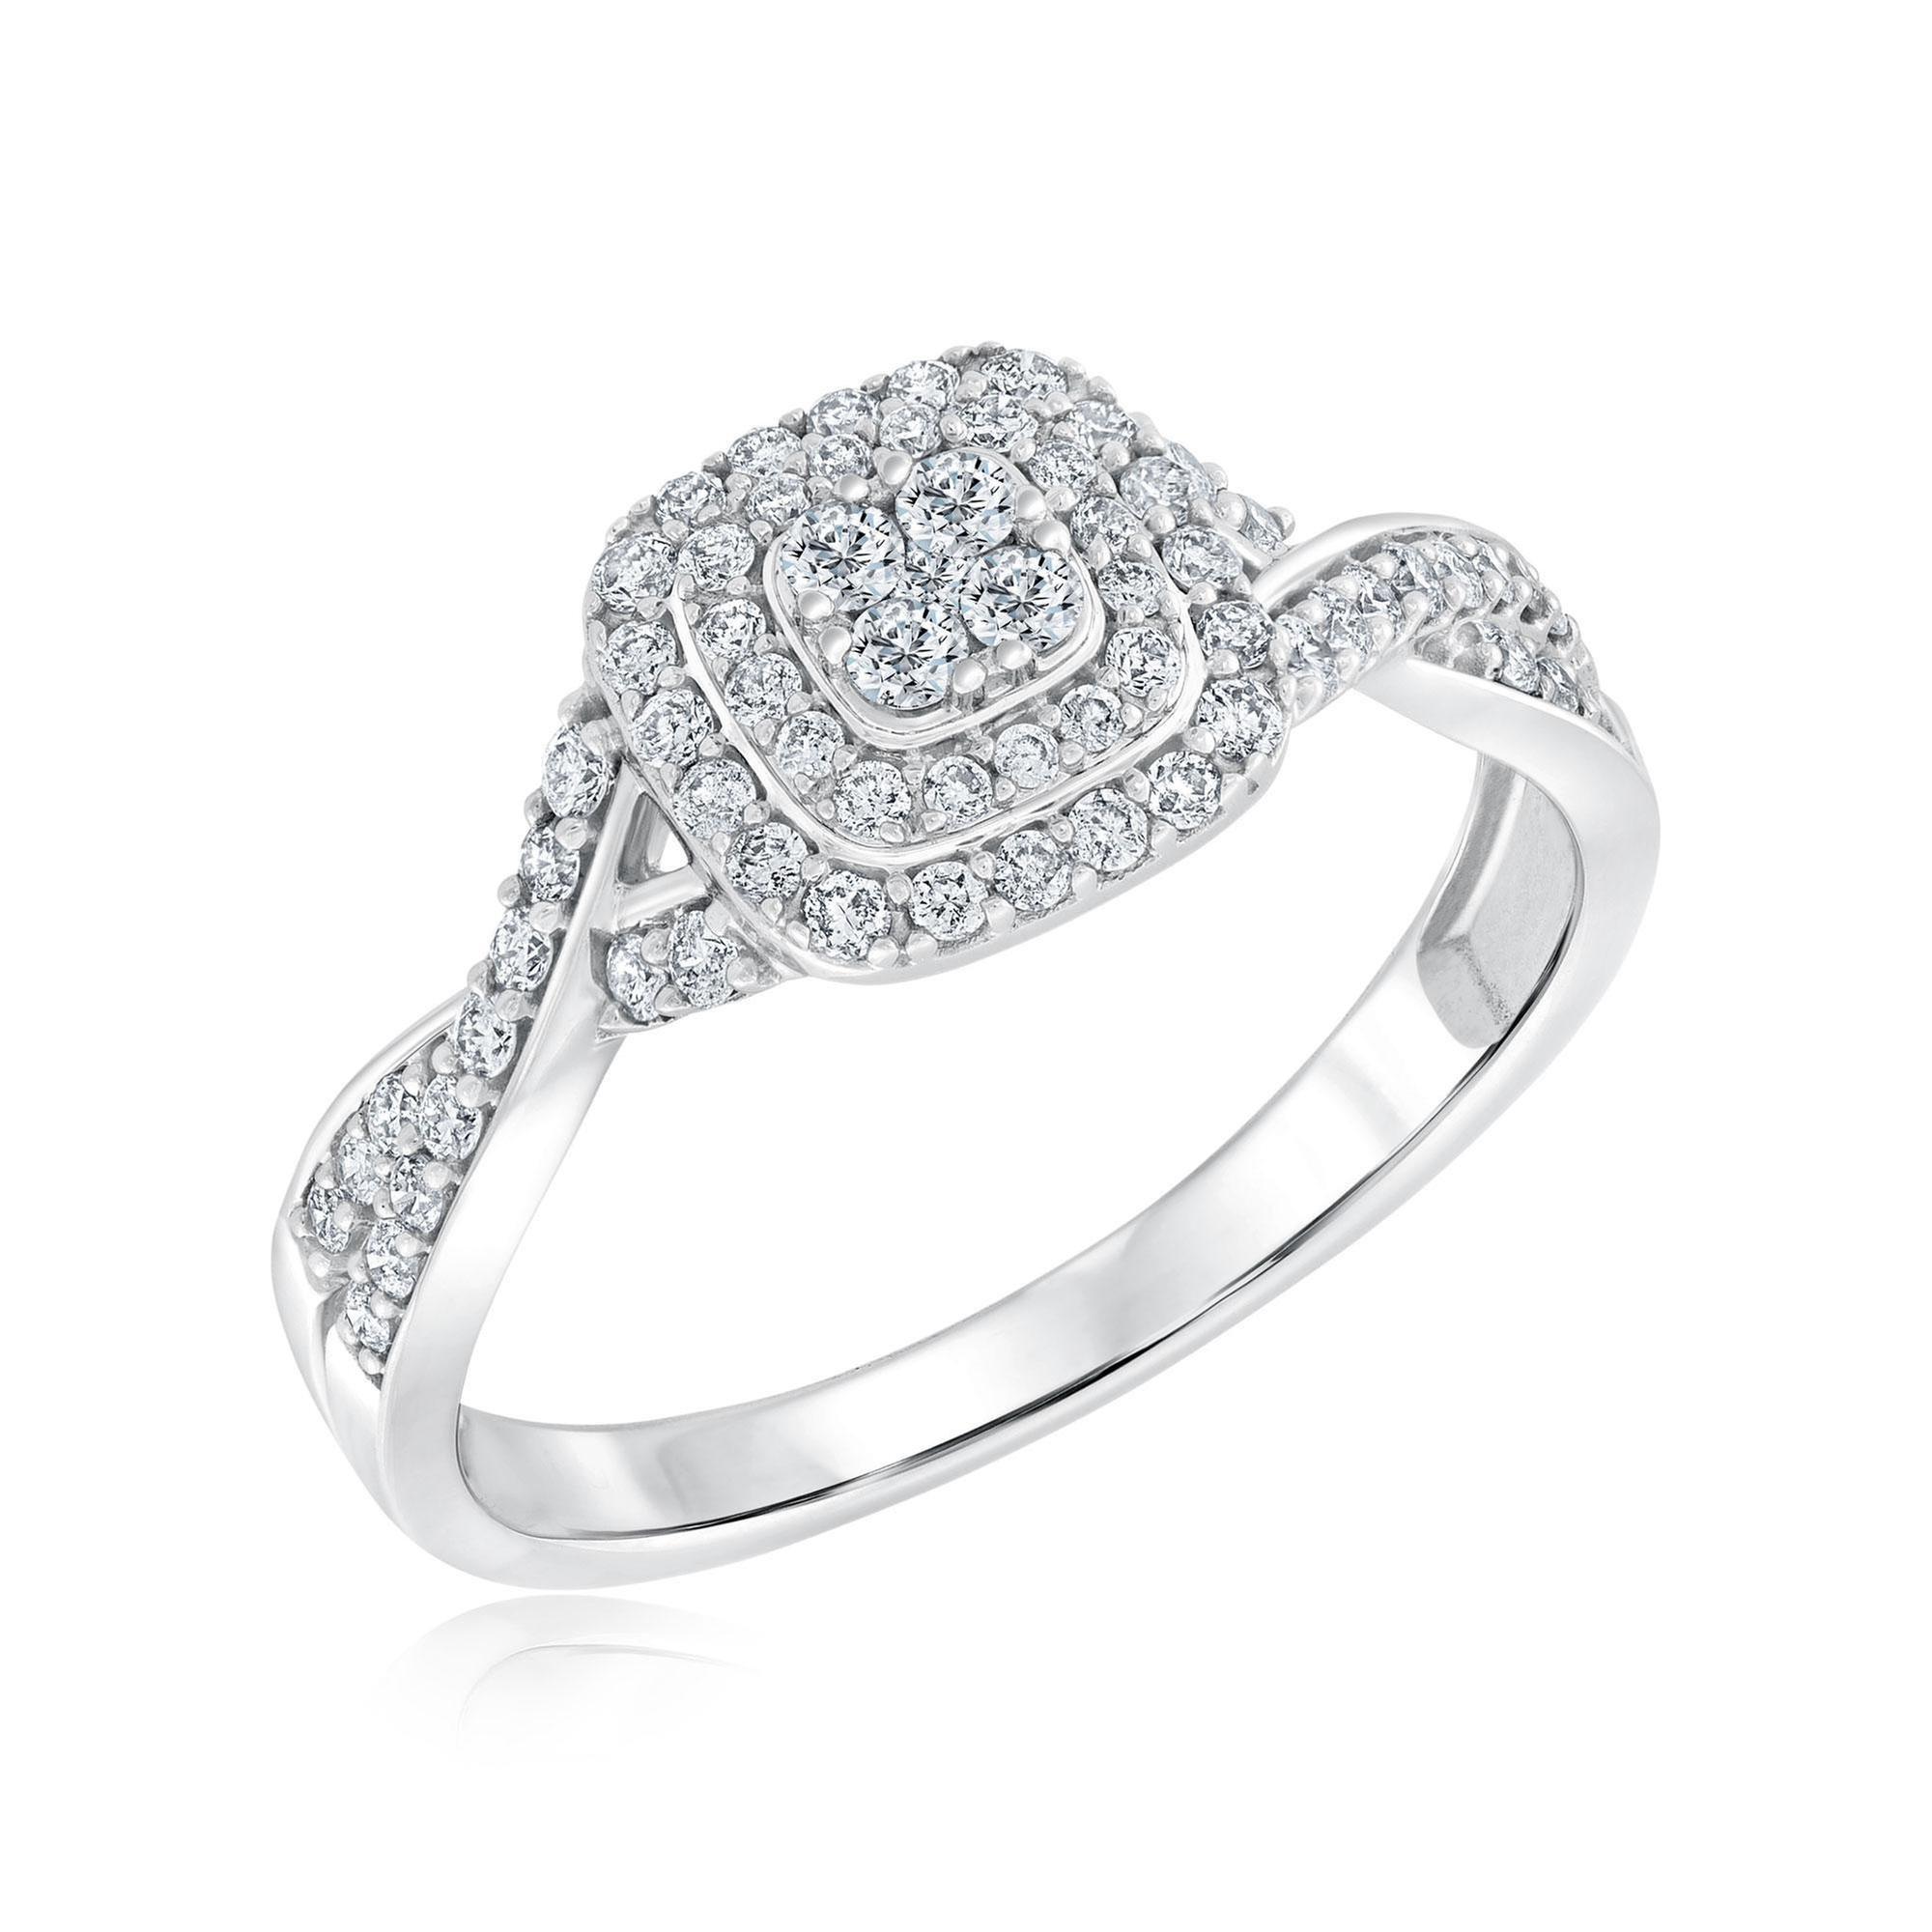 Round Diamond Multi-Top Twist Band Engagement Ring 1/2ctw - Size 7